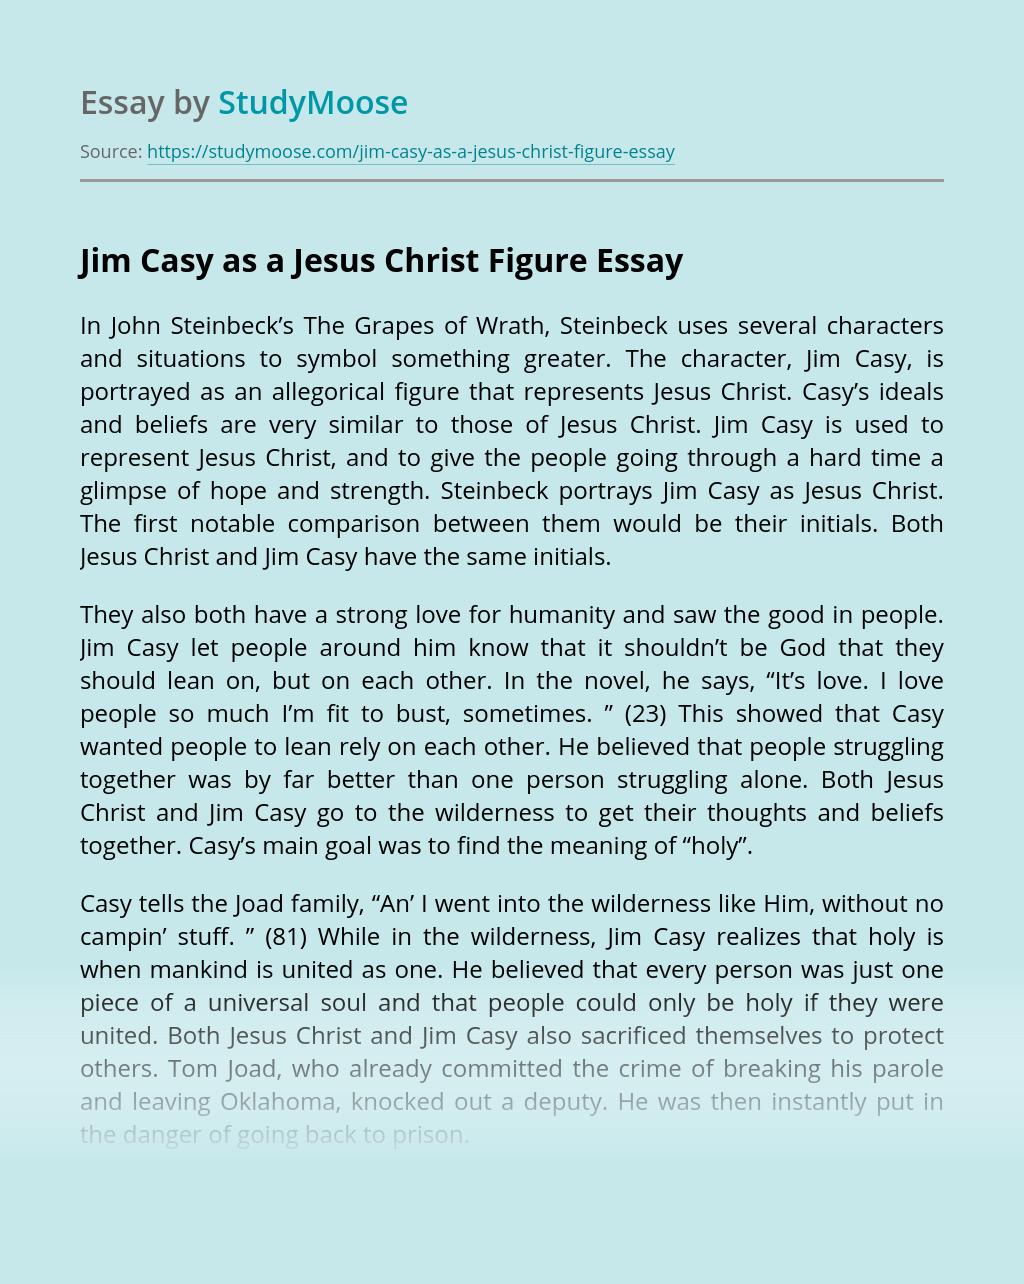 Jim Casy as a Jesus Christ Figure